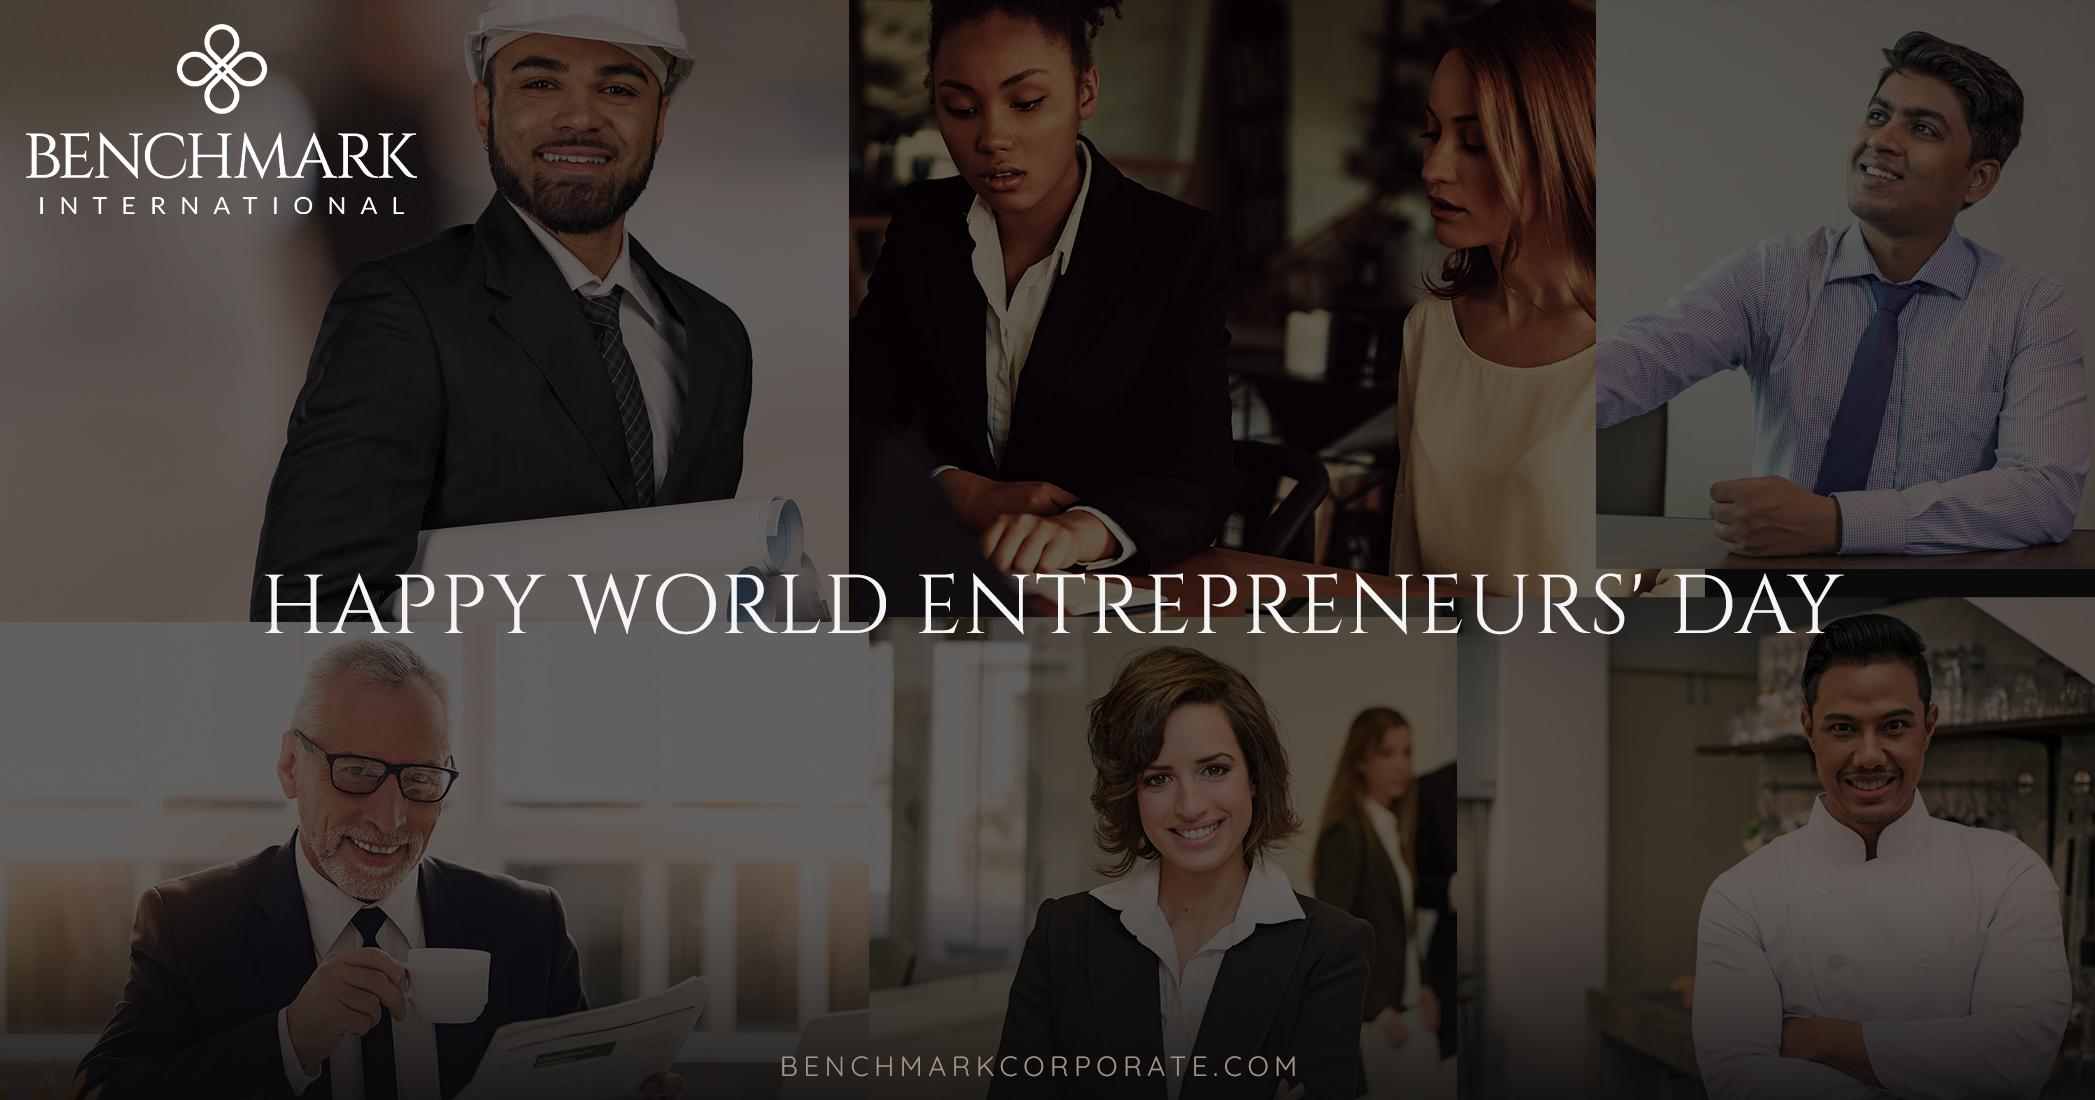 Happy World Entrepreneurs' Day!